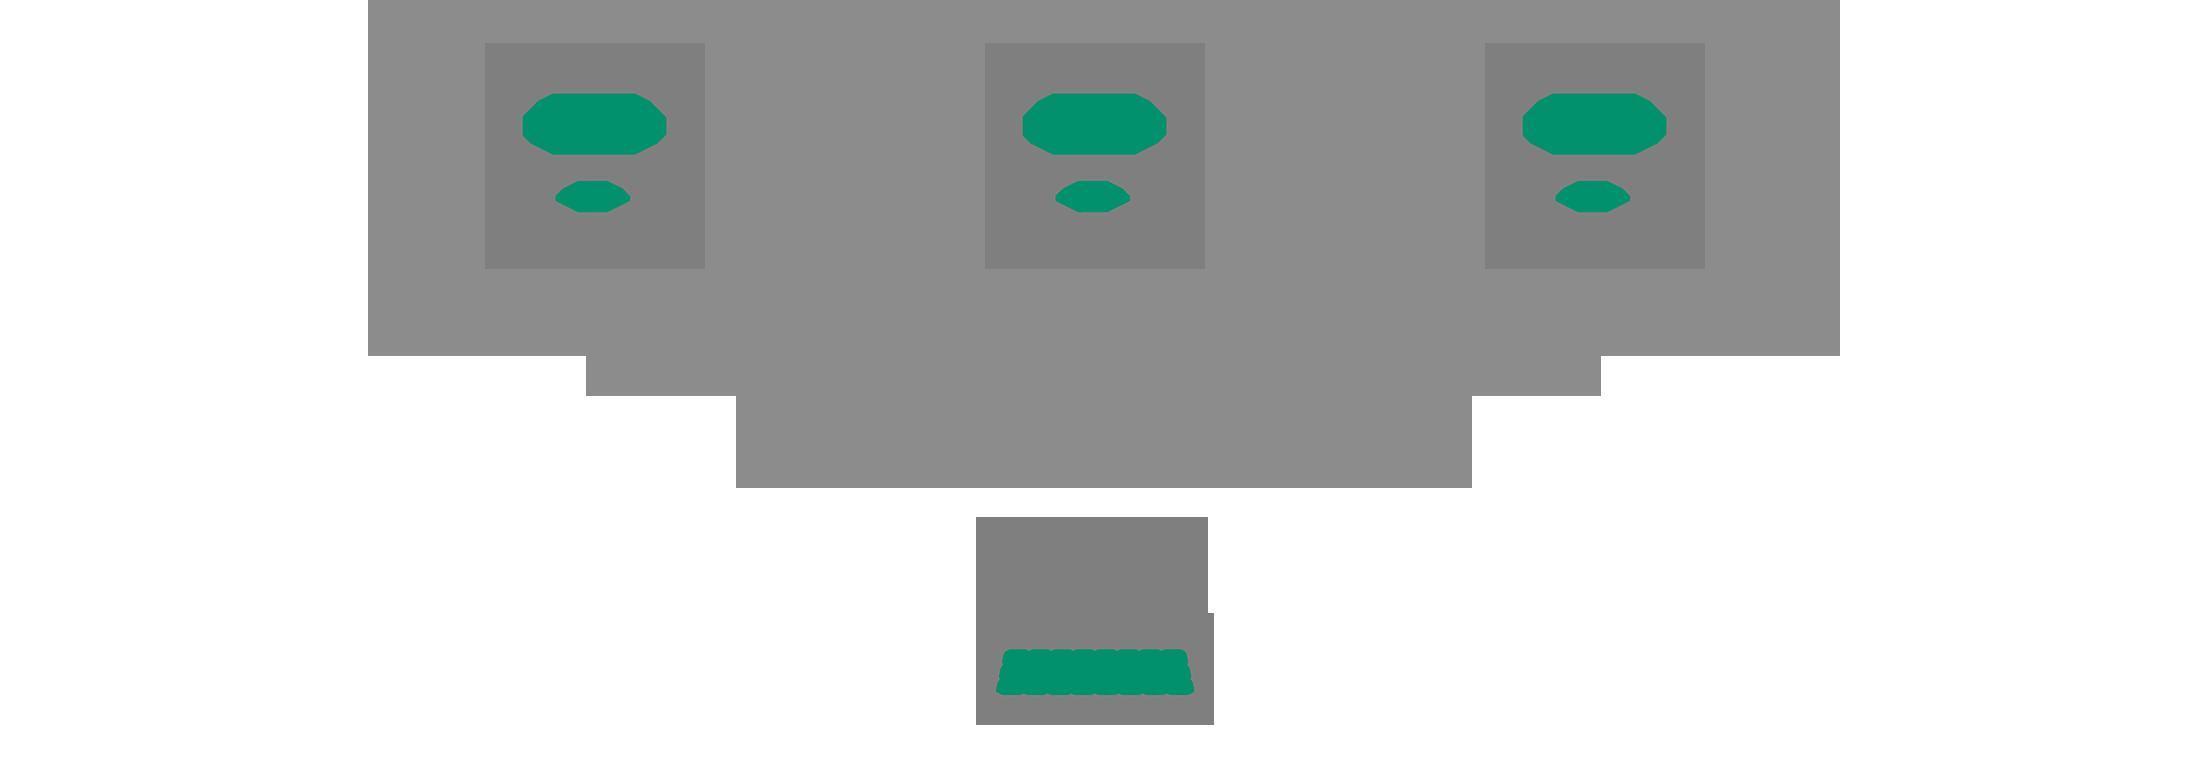 Multiple-device installation